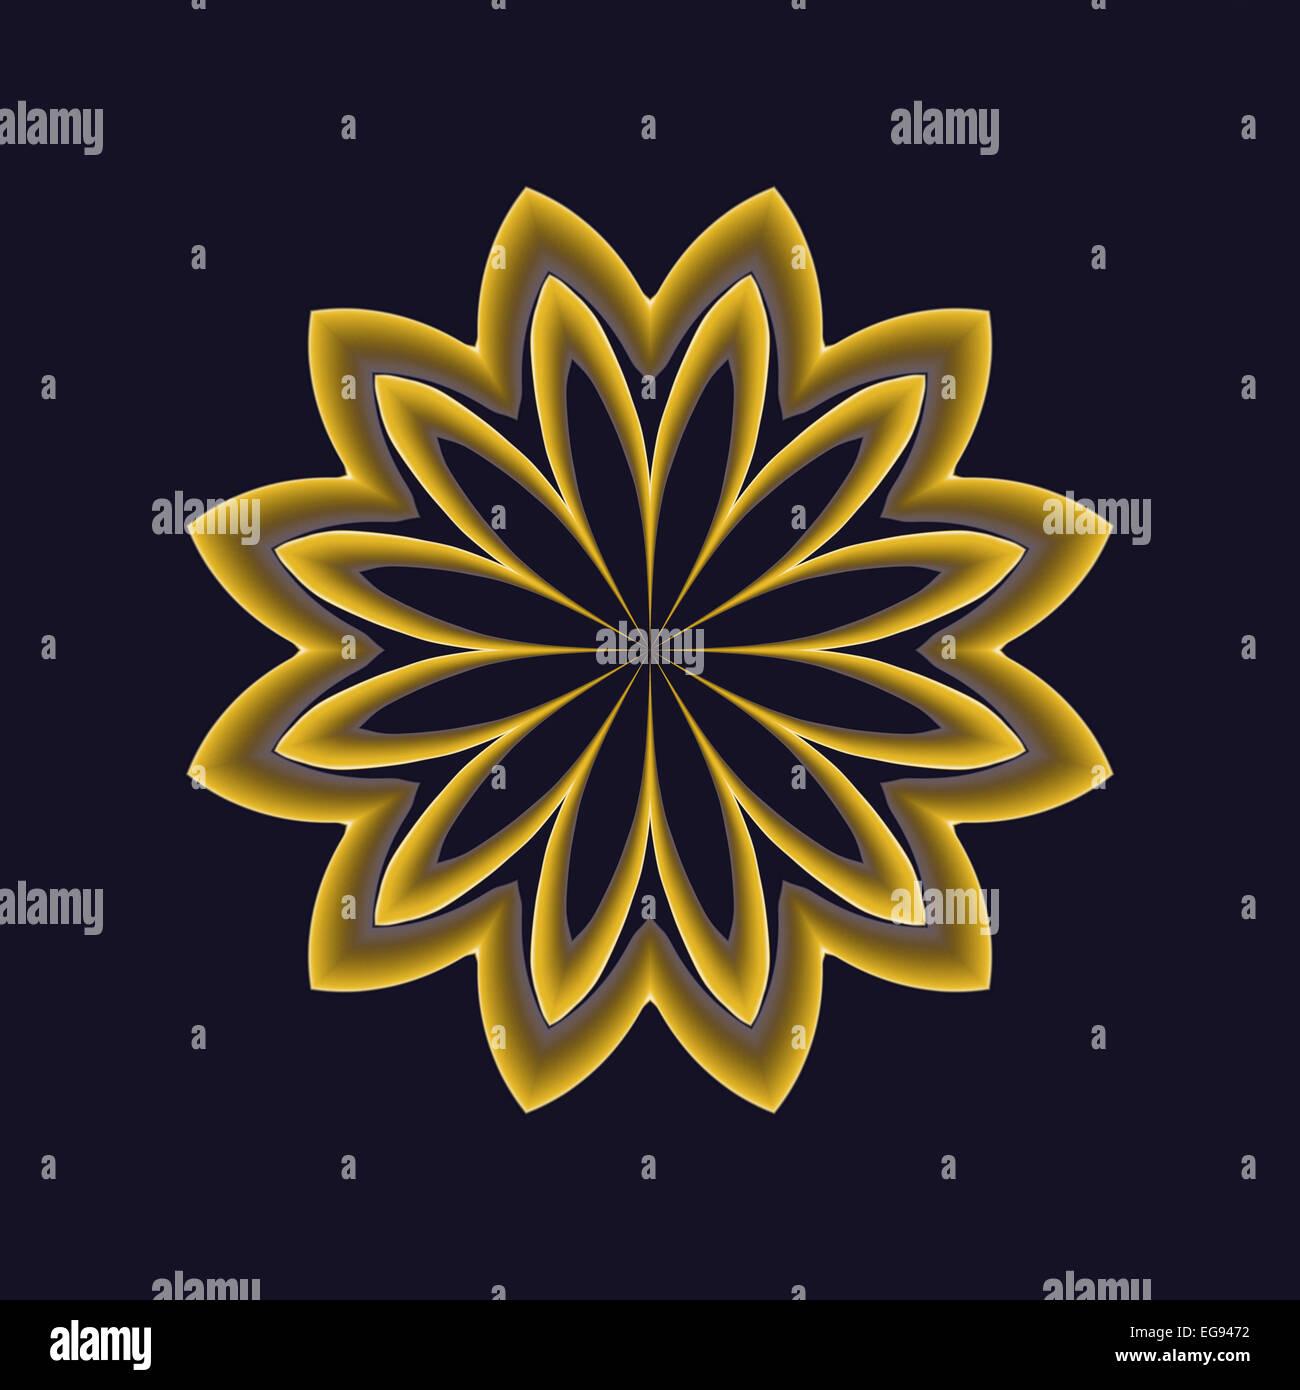 Abstract Gold Flower On Dark Blue Background